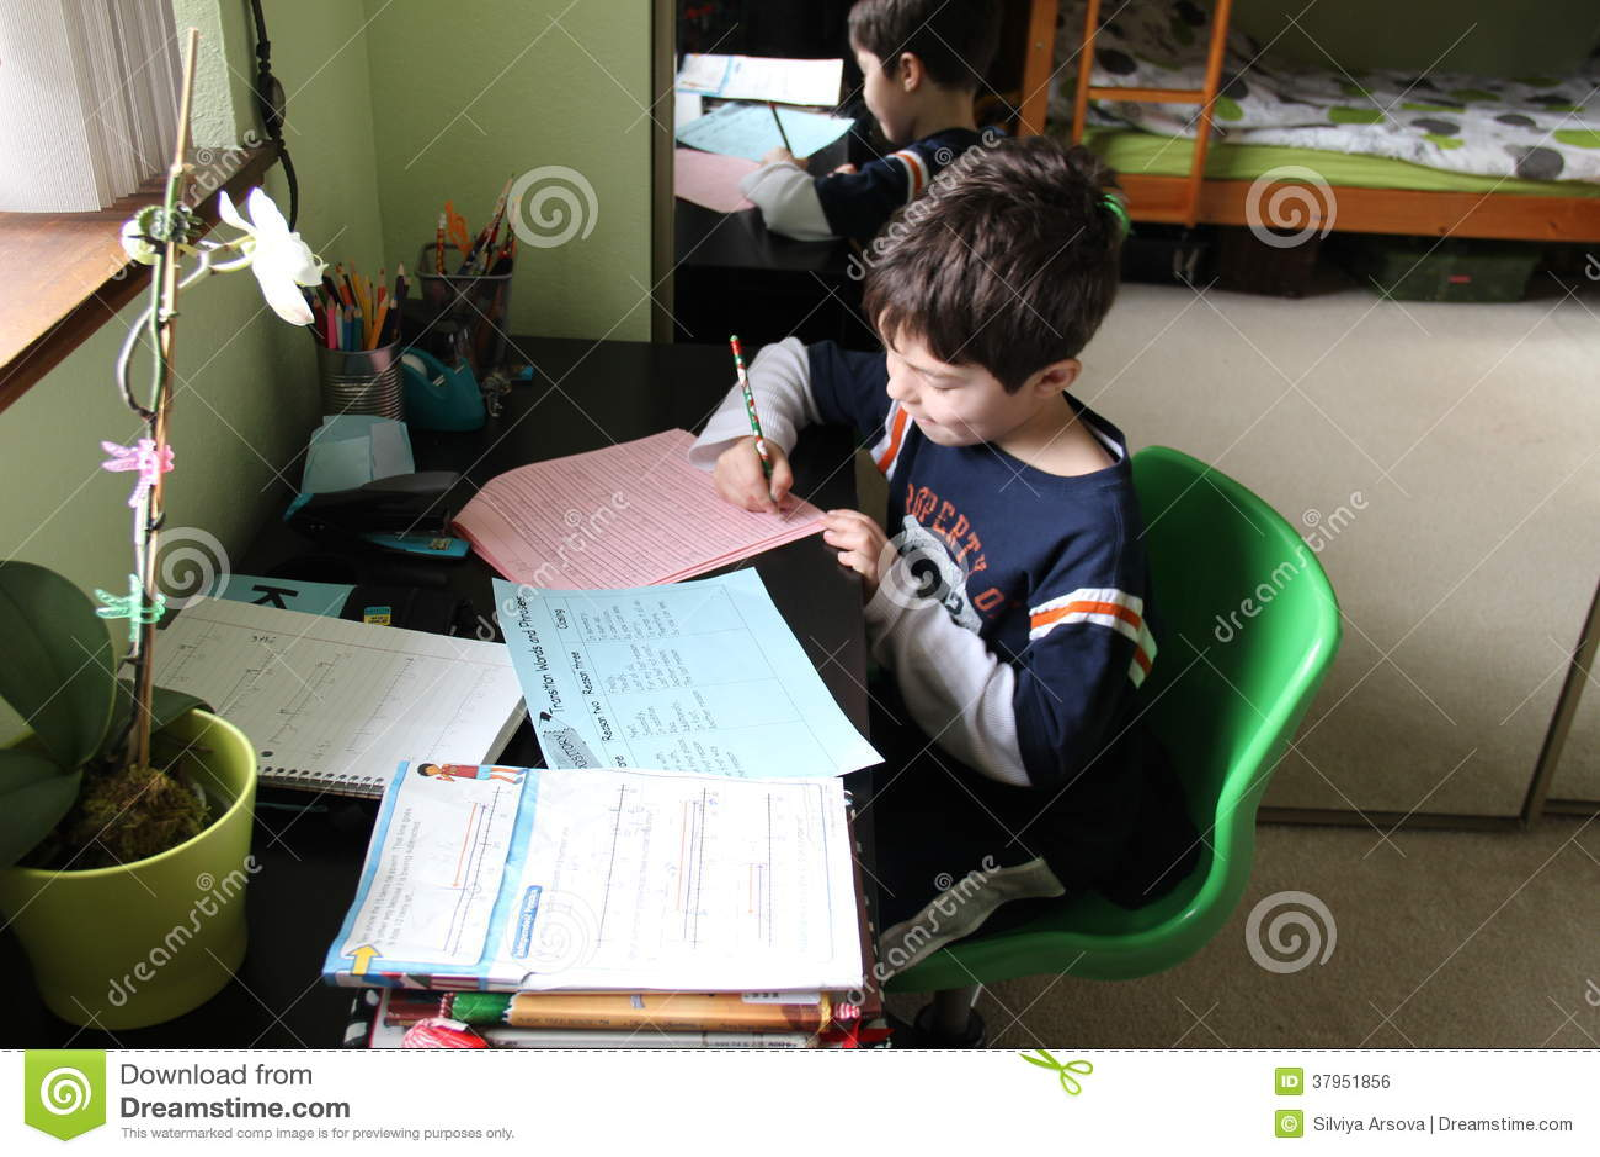 school-work-home-young-kid-doing-his-homework-37951856.jpg